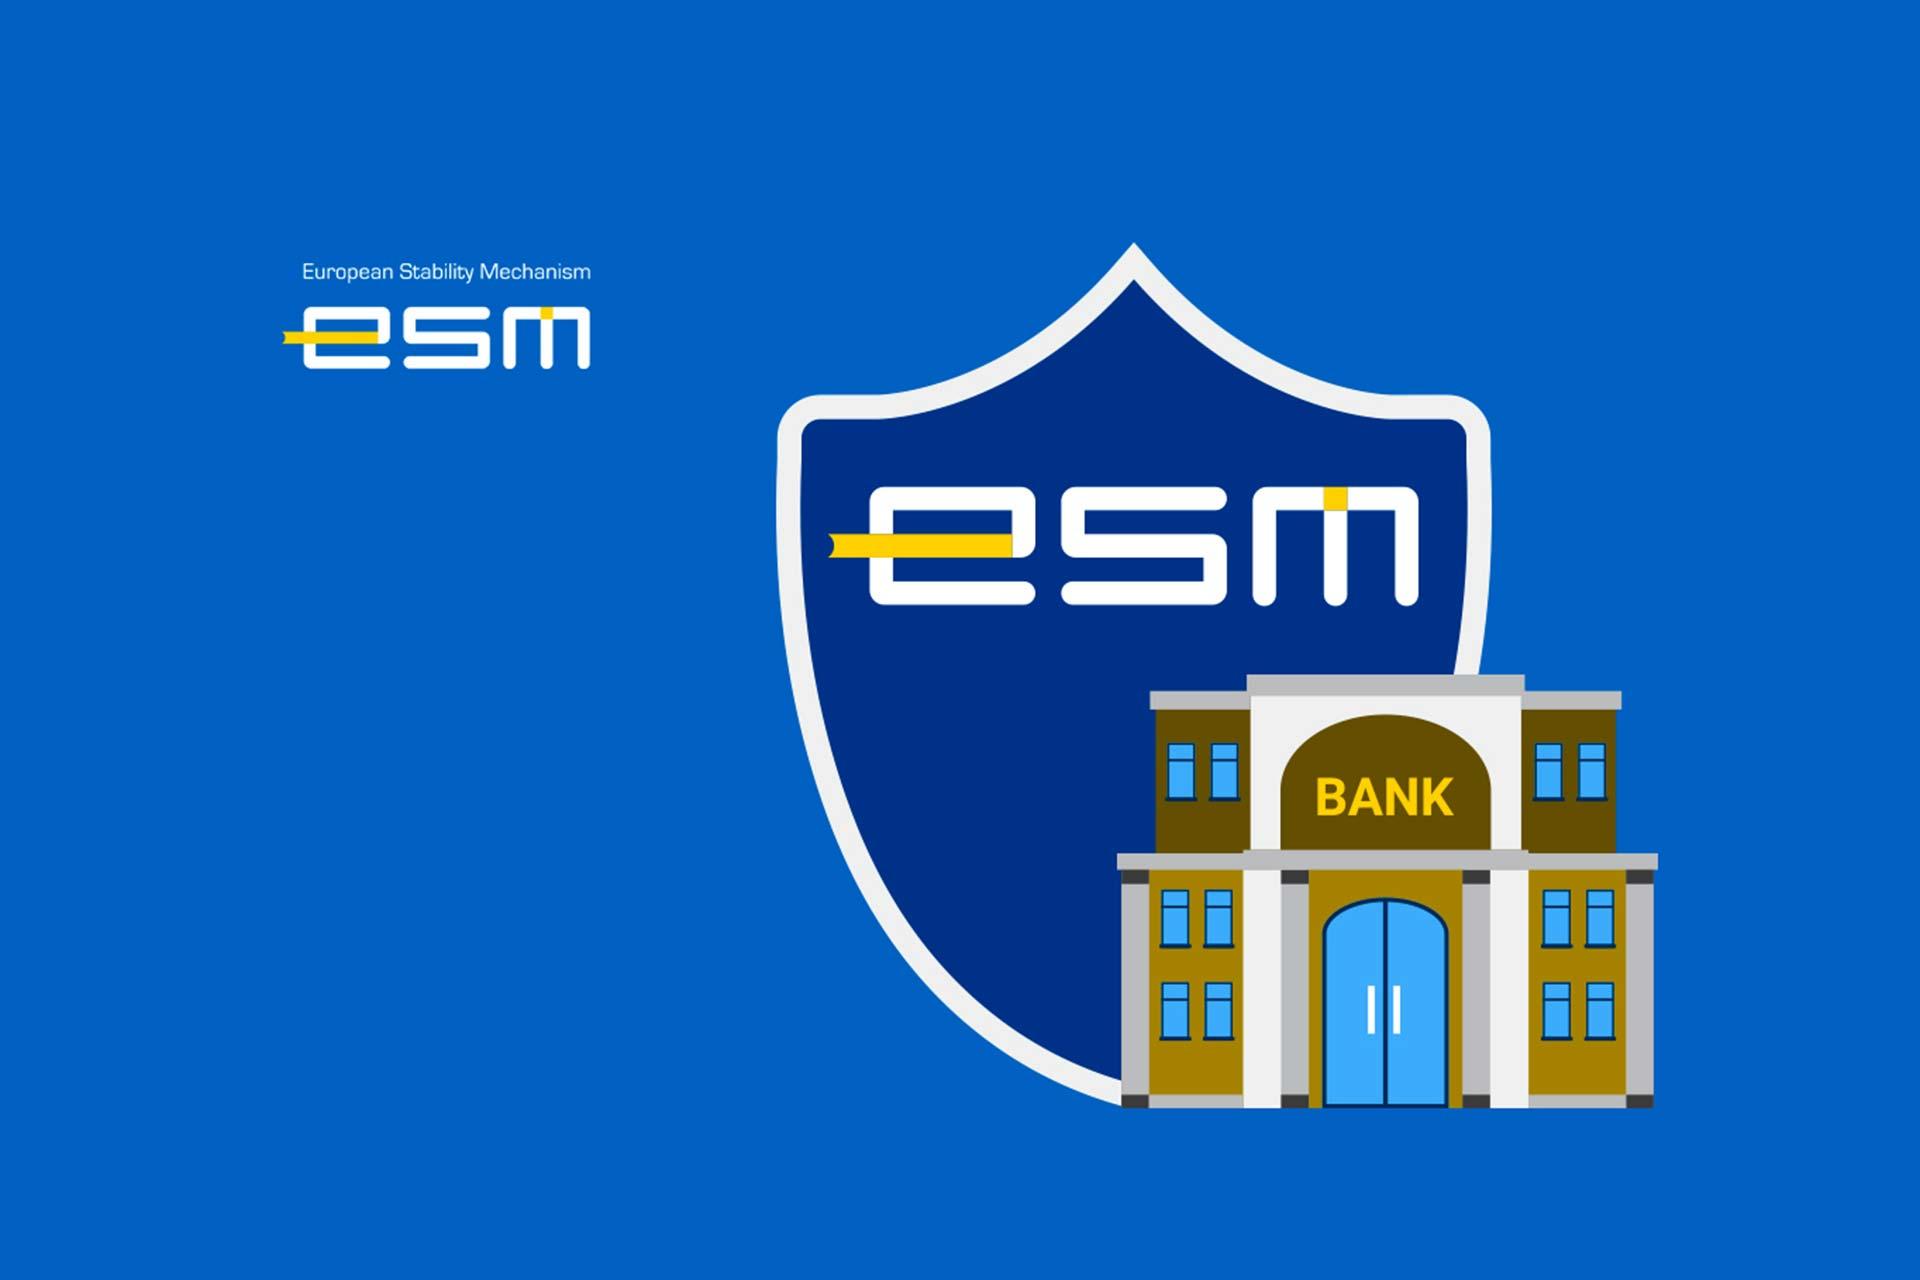 European Stability Mechanism (ESM) Bank